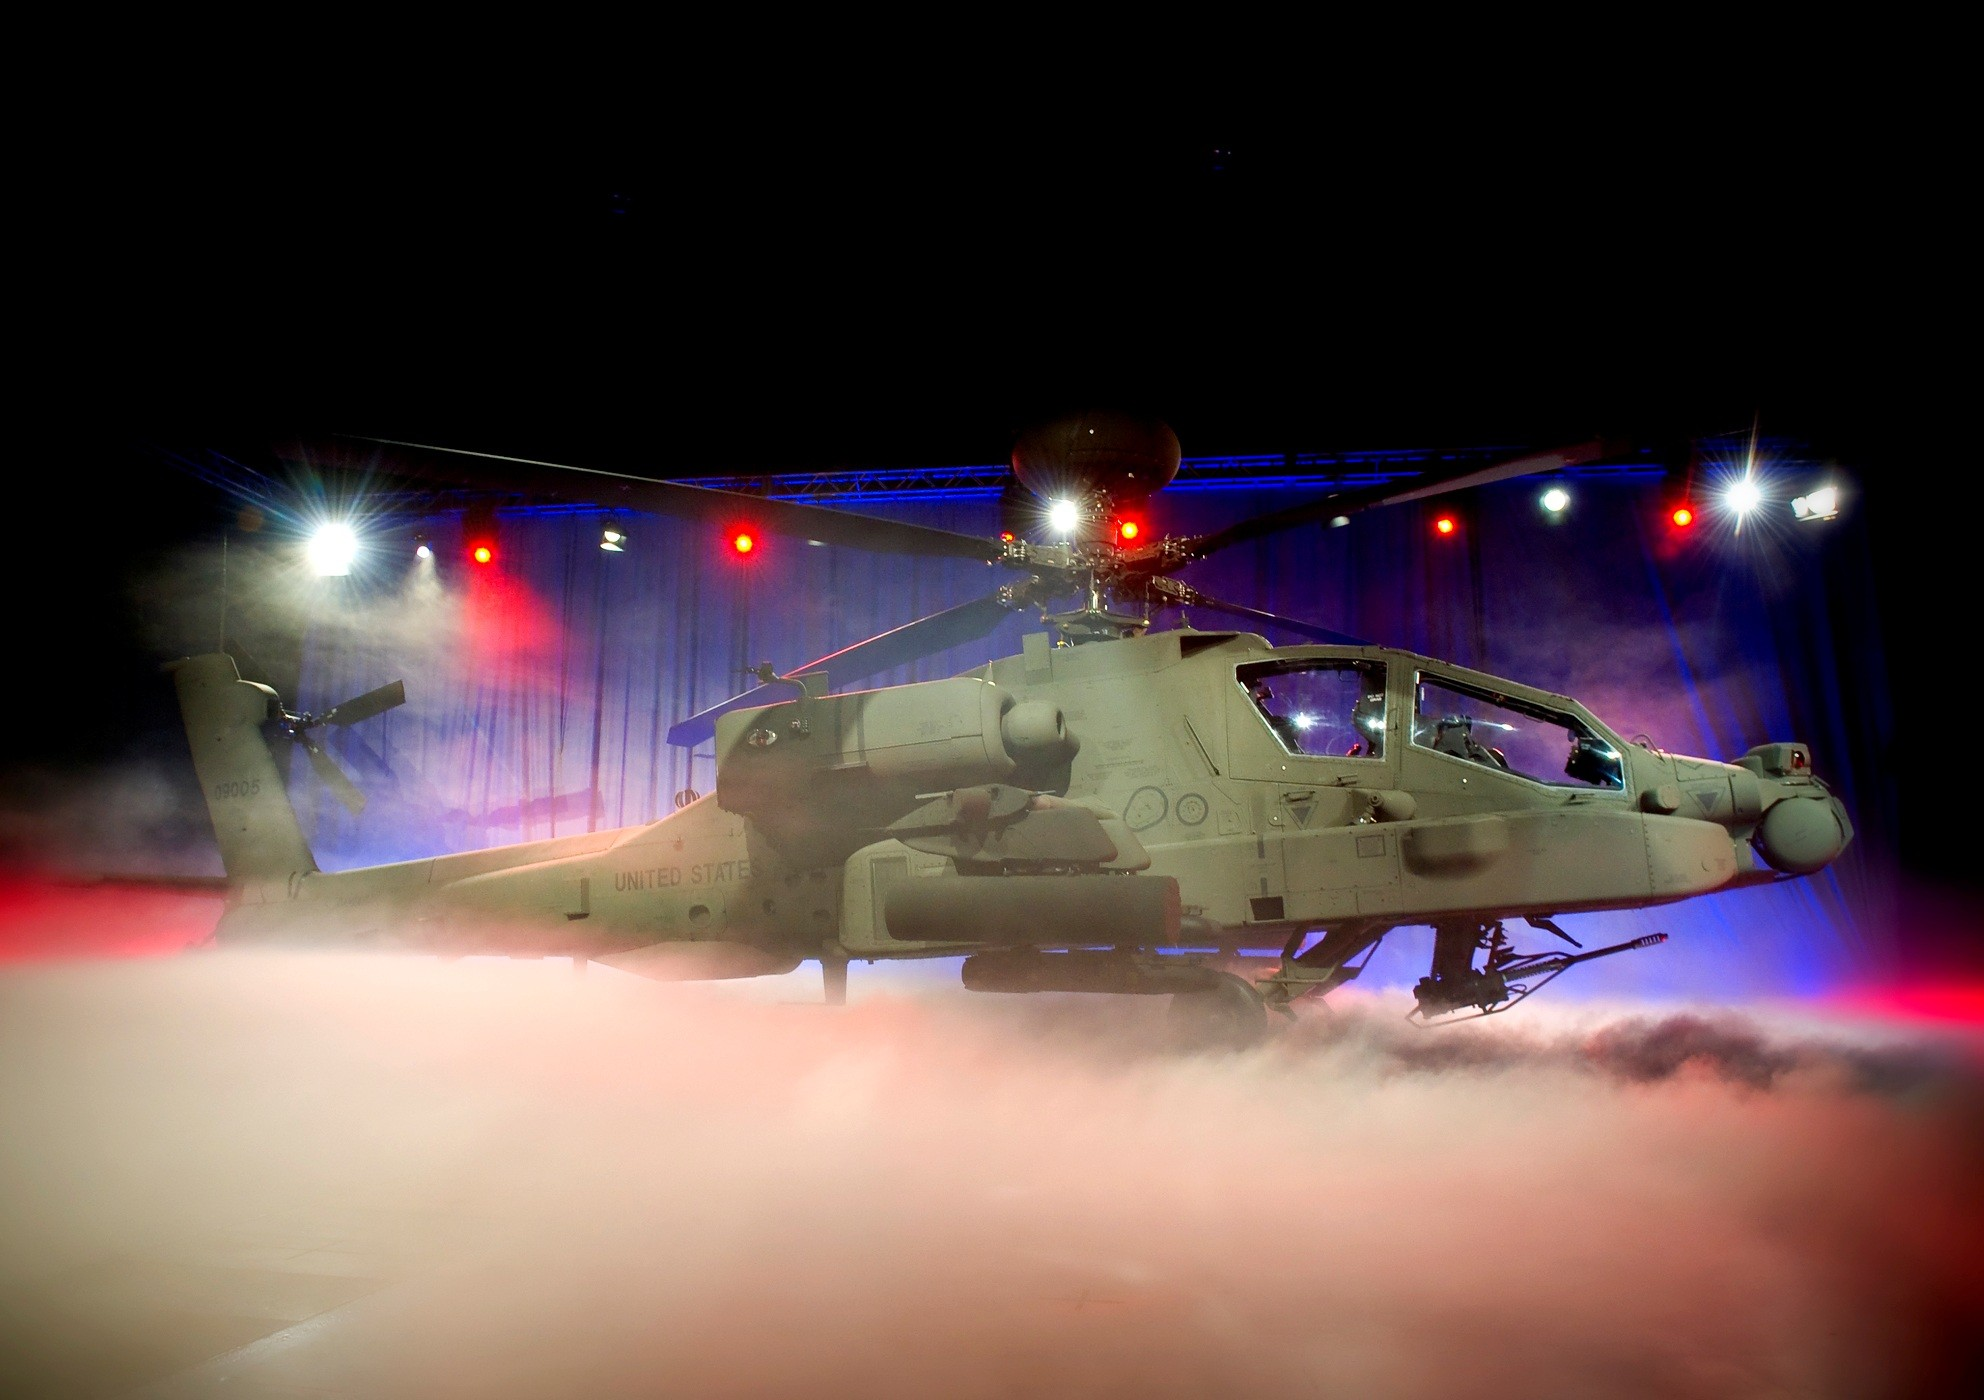 Top 10 Punto Medio Noticias | Acquisition Manager Air Force Reddit